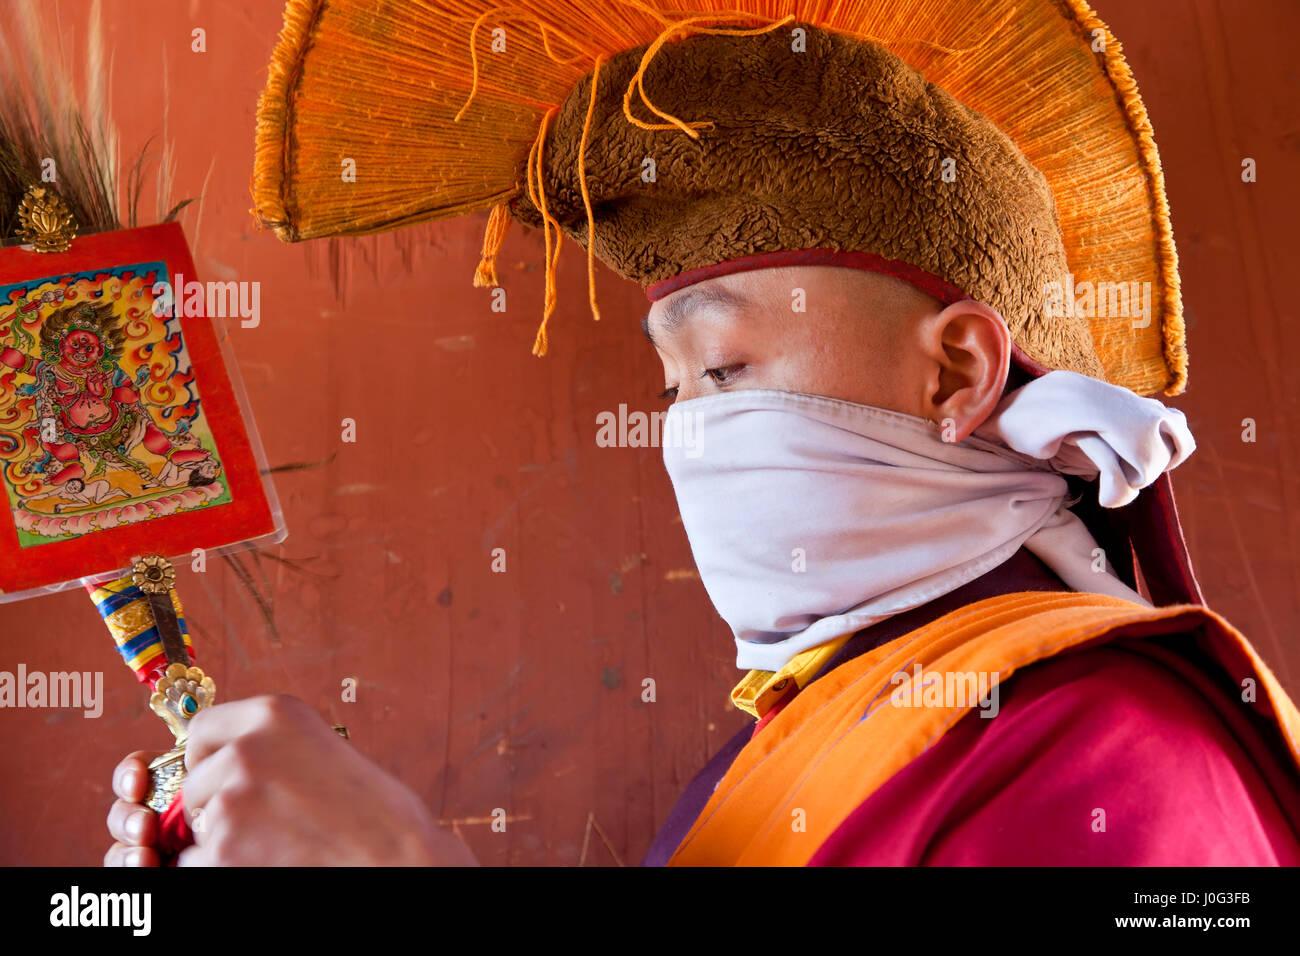 Monk, Tamshing Phala Chhoupa Tamshing festival, Monastère, nr Jakar, Bumthang, Bhoutan Photo Stock